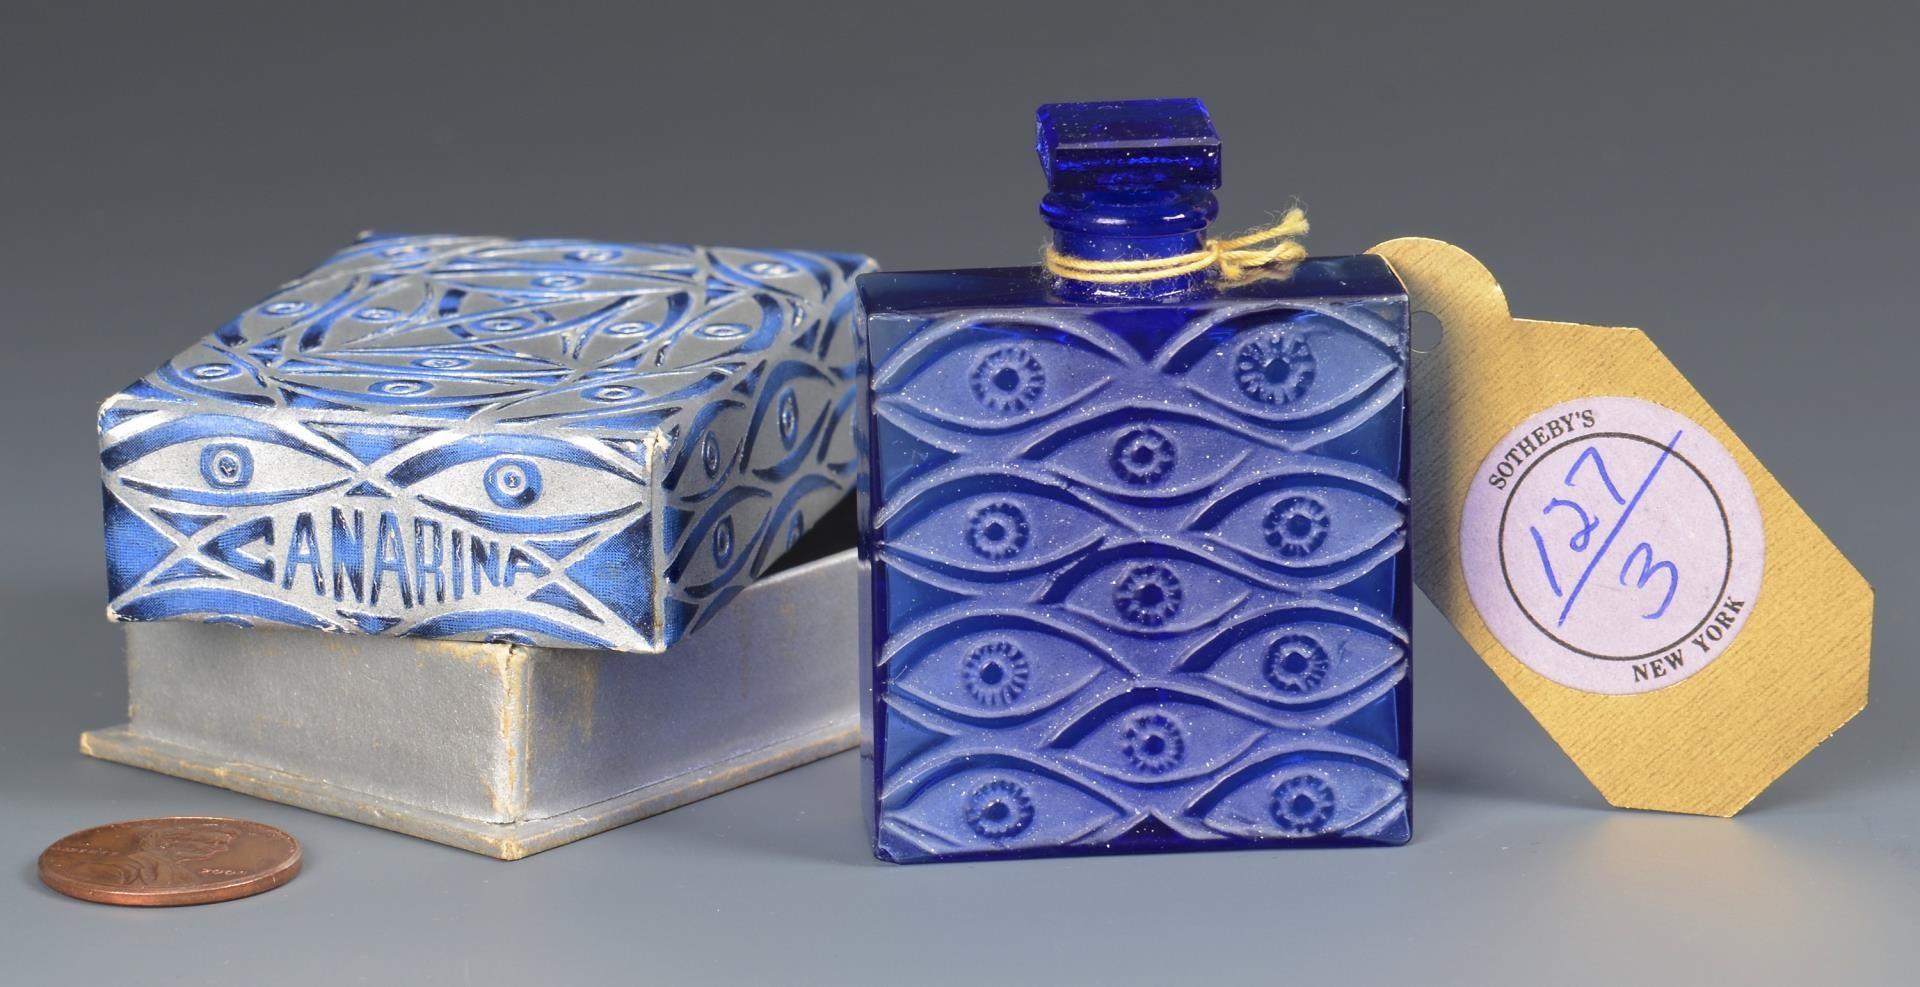 Lot 3594263: R. Lalique Canarina Perfume Bottle